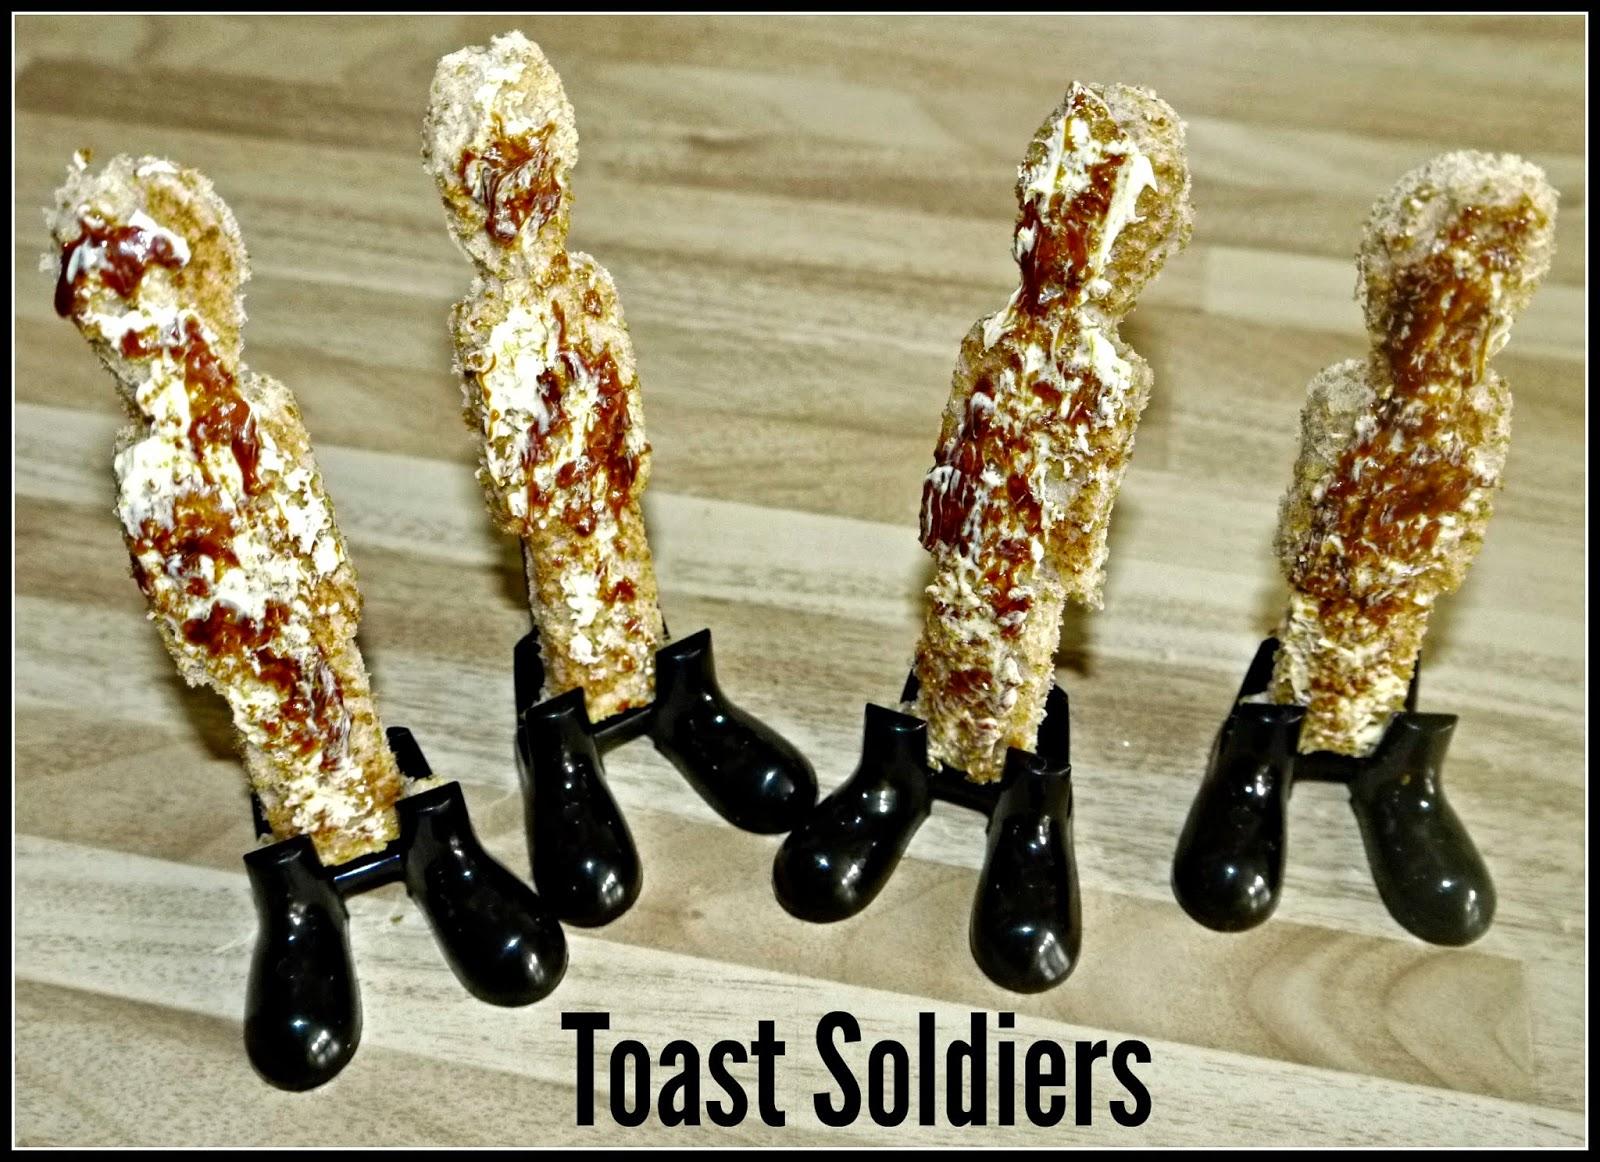 bread, toast